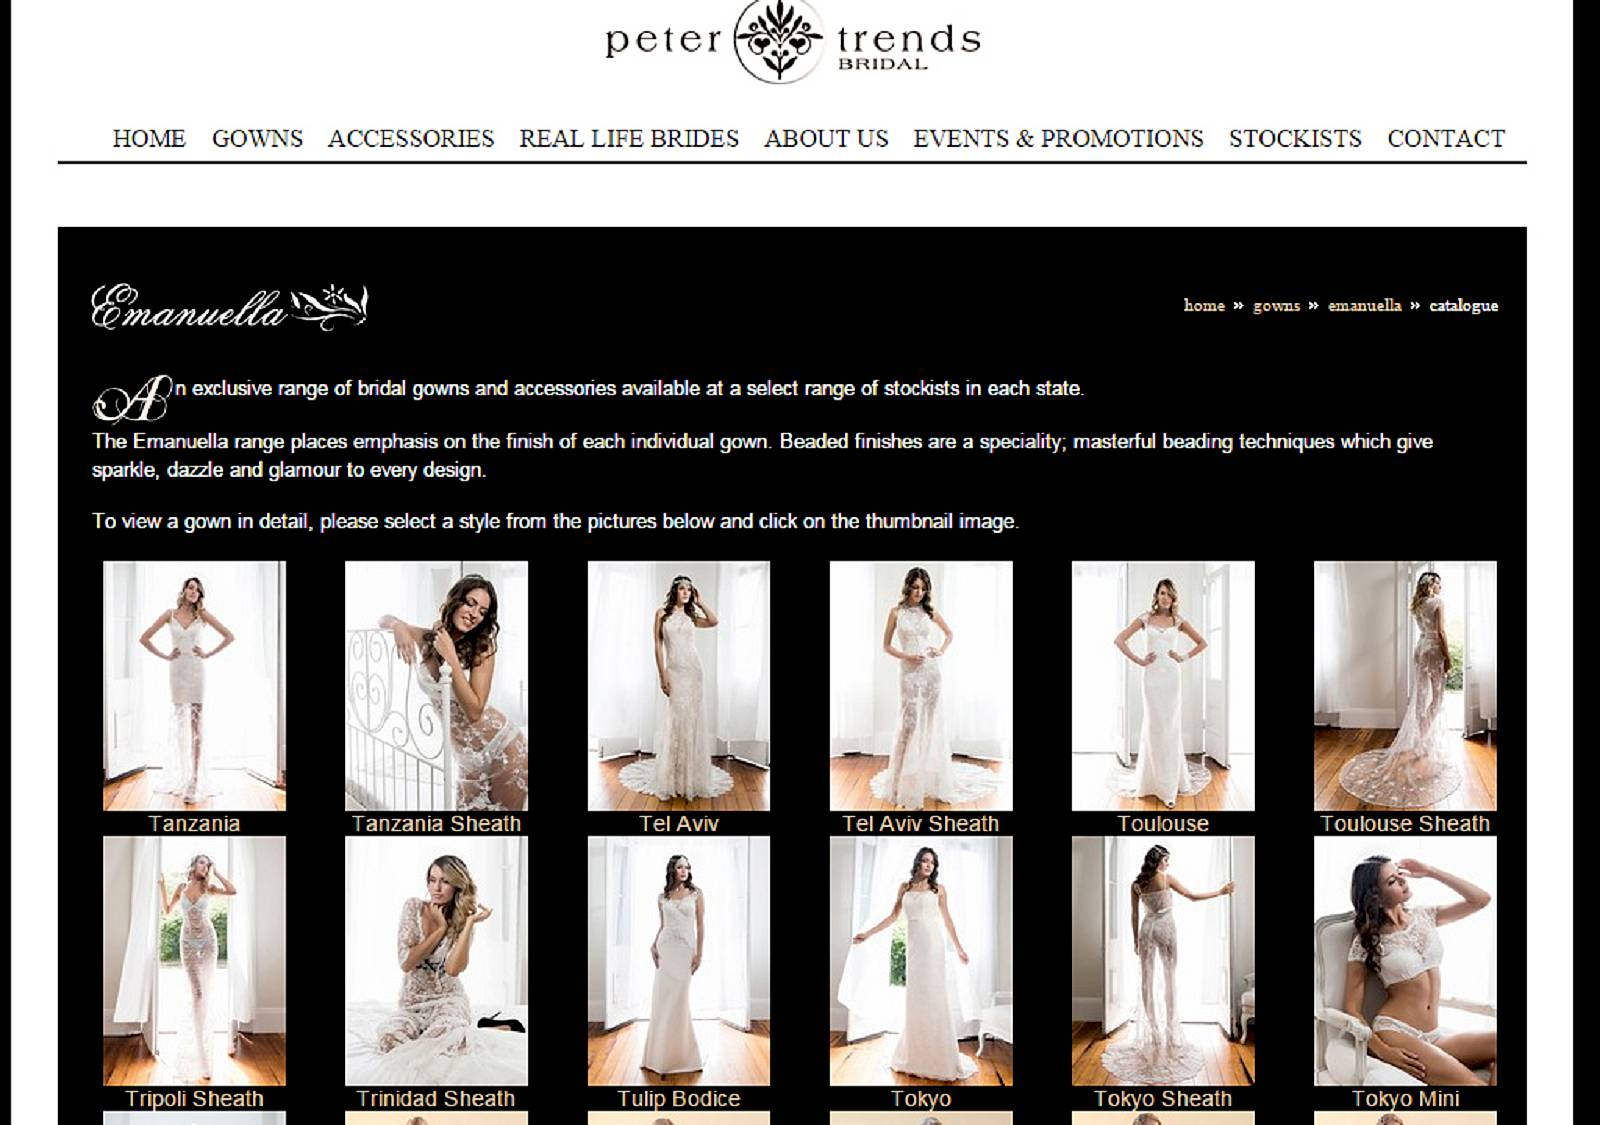 Peter Trends Bridal